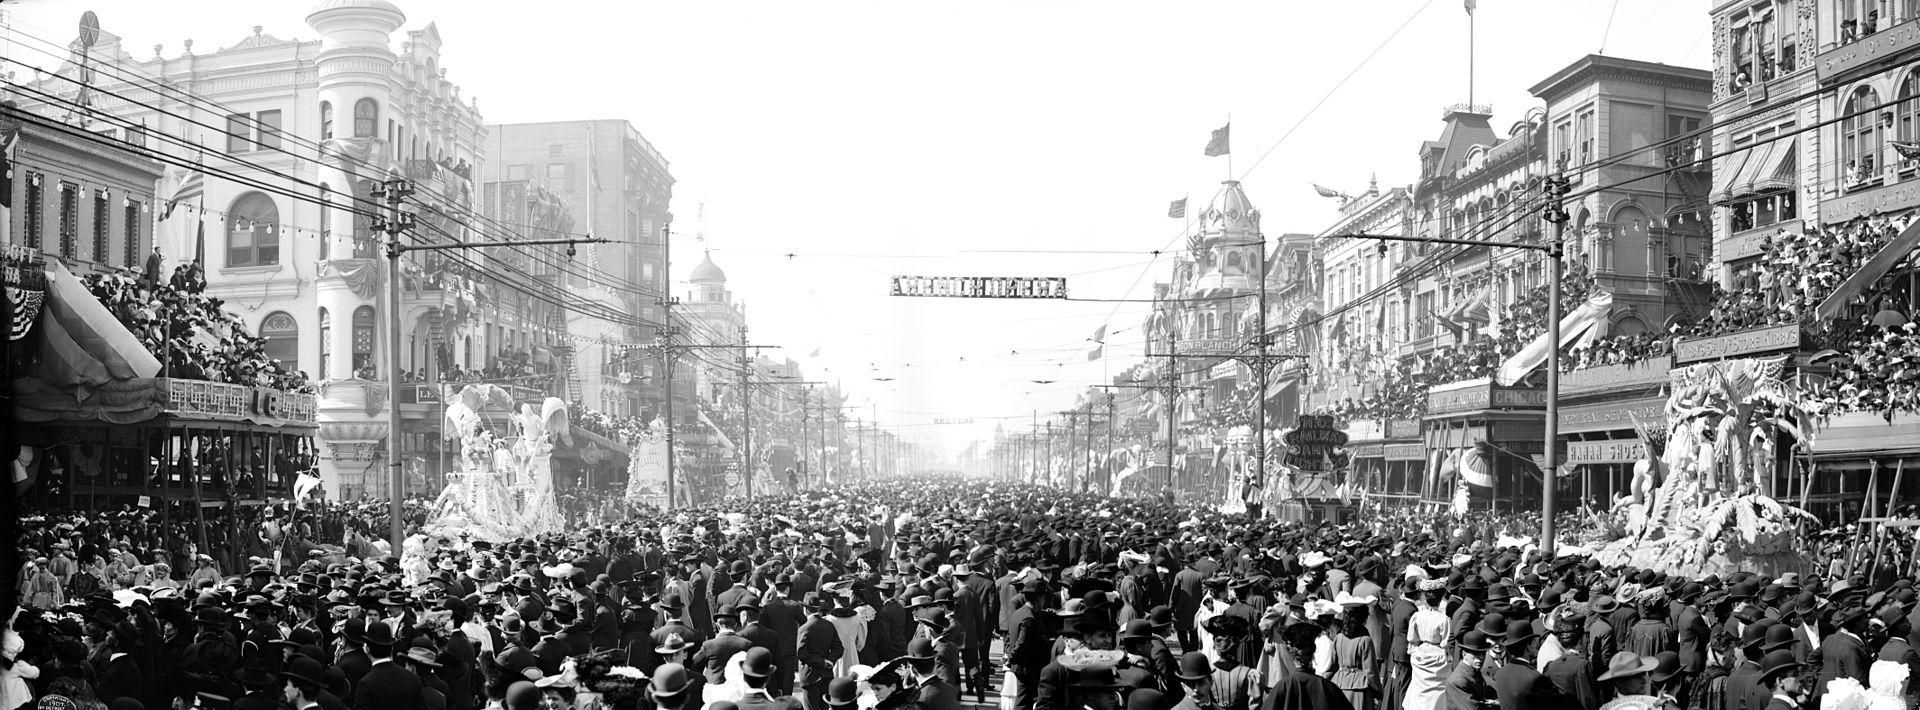 Mardi Gras in 1907